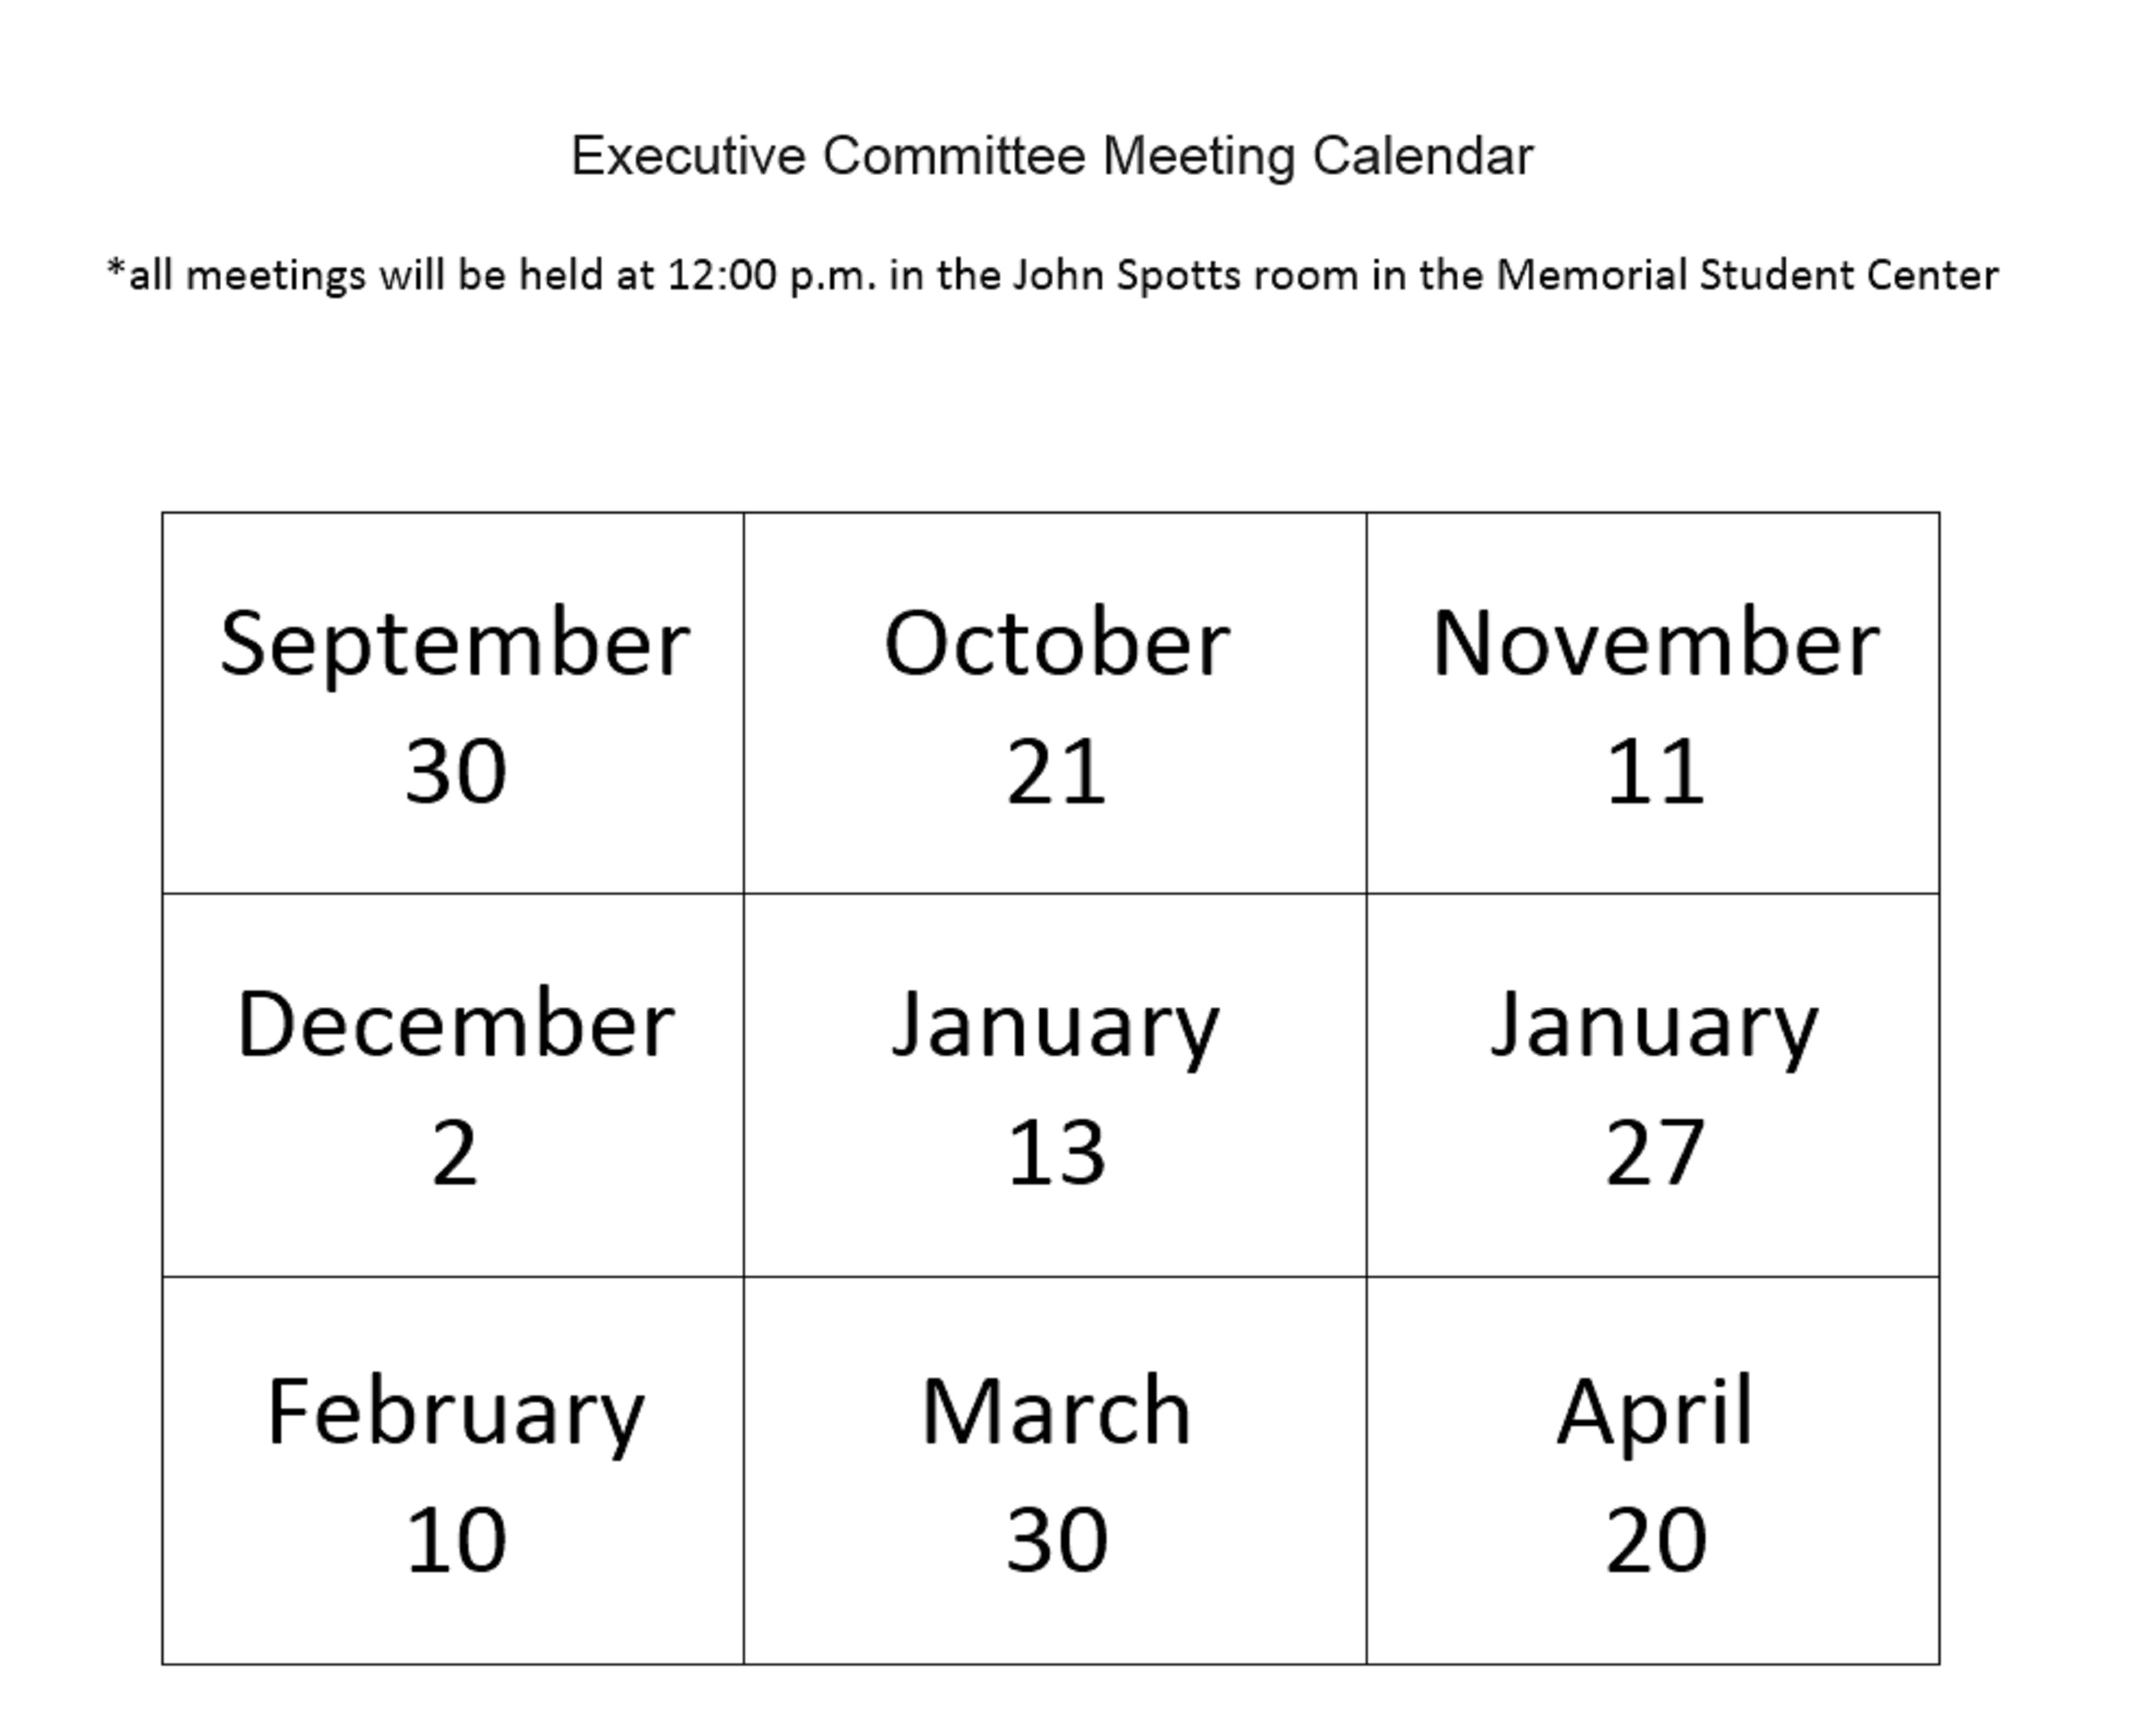 Senate Calendar December 2020 Executive Committee Calendar   Faculty Senate   Marshall University